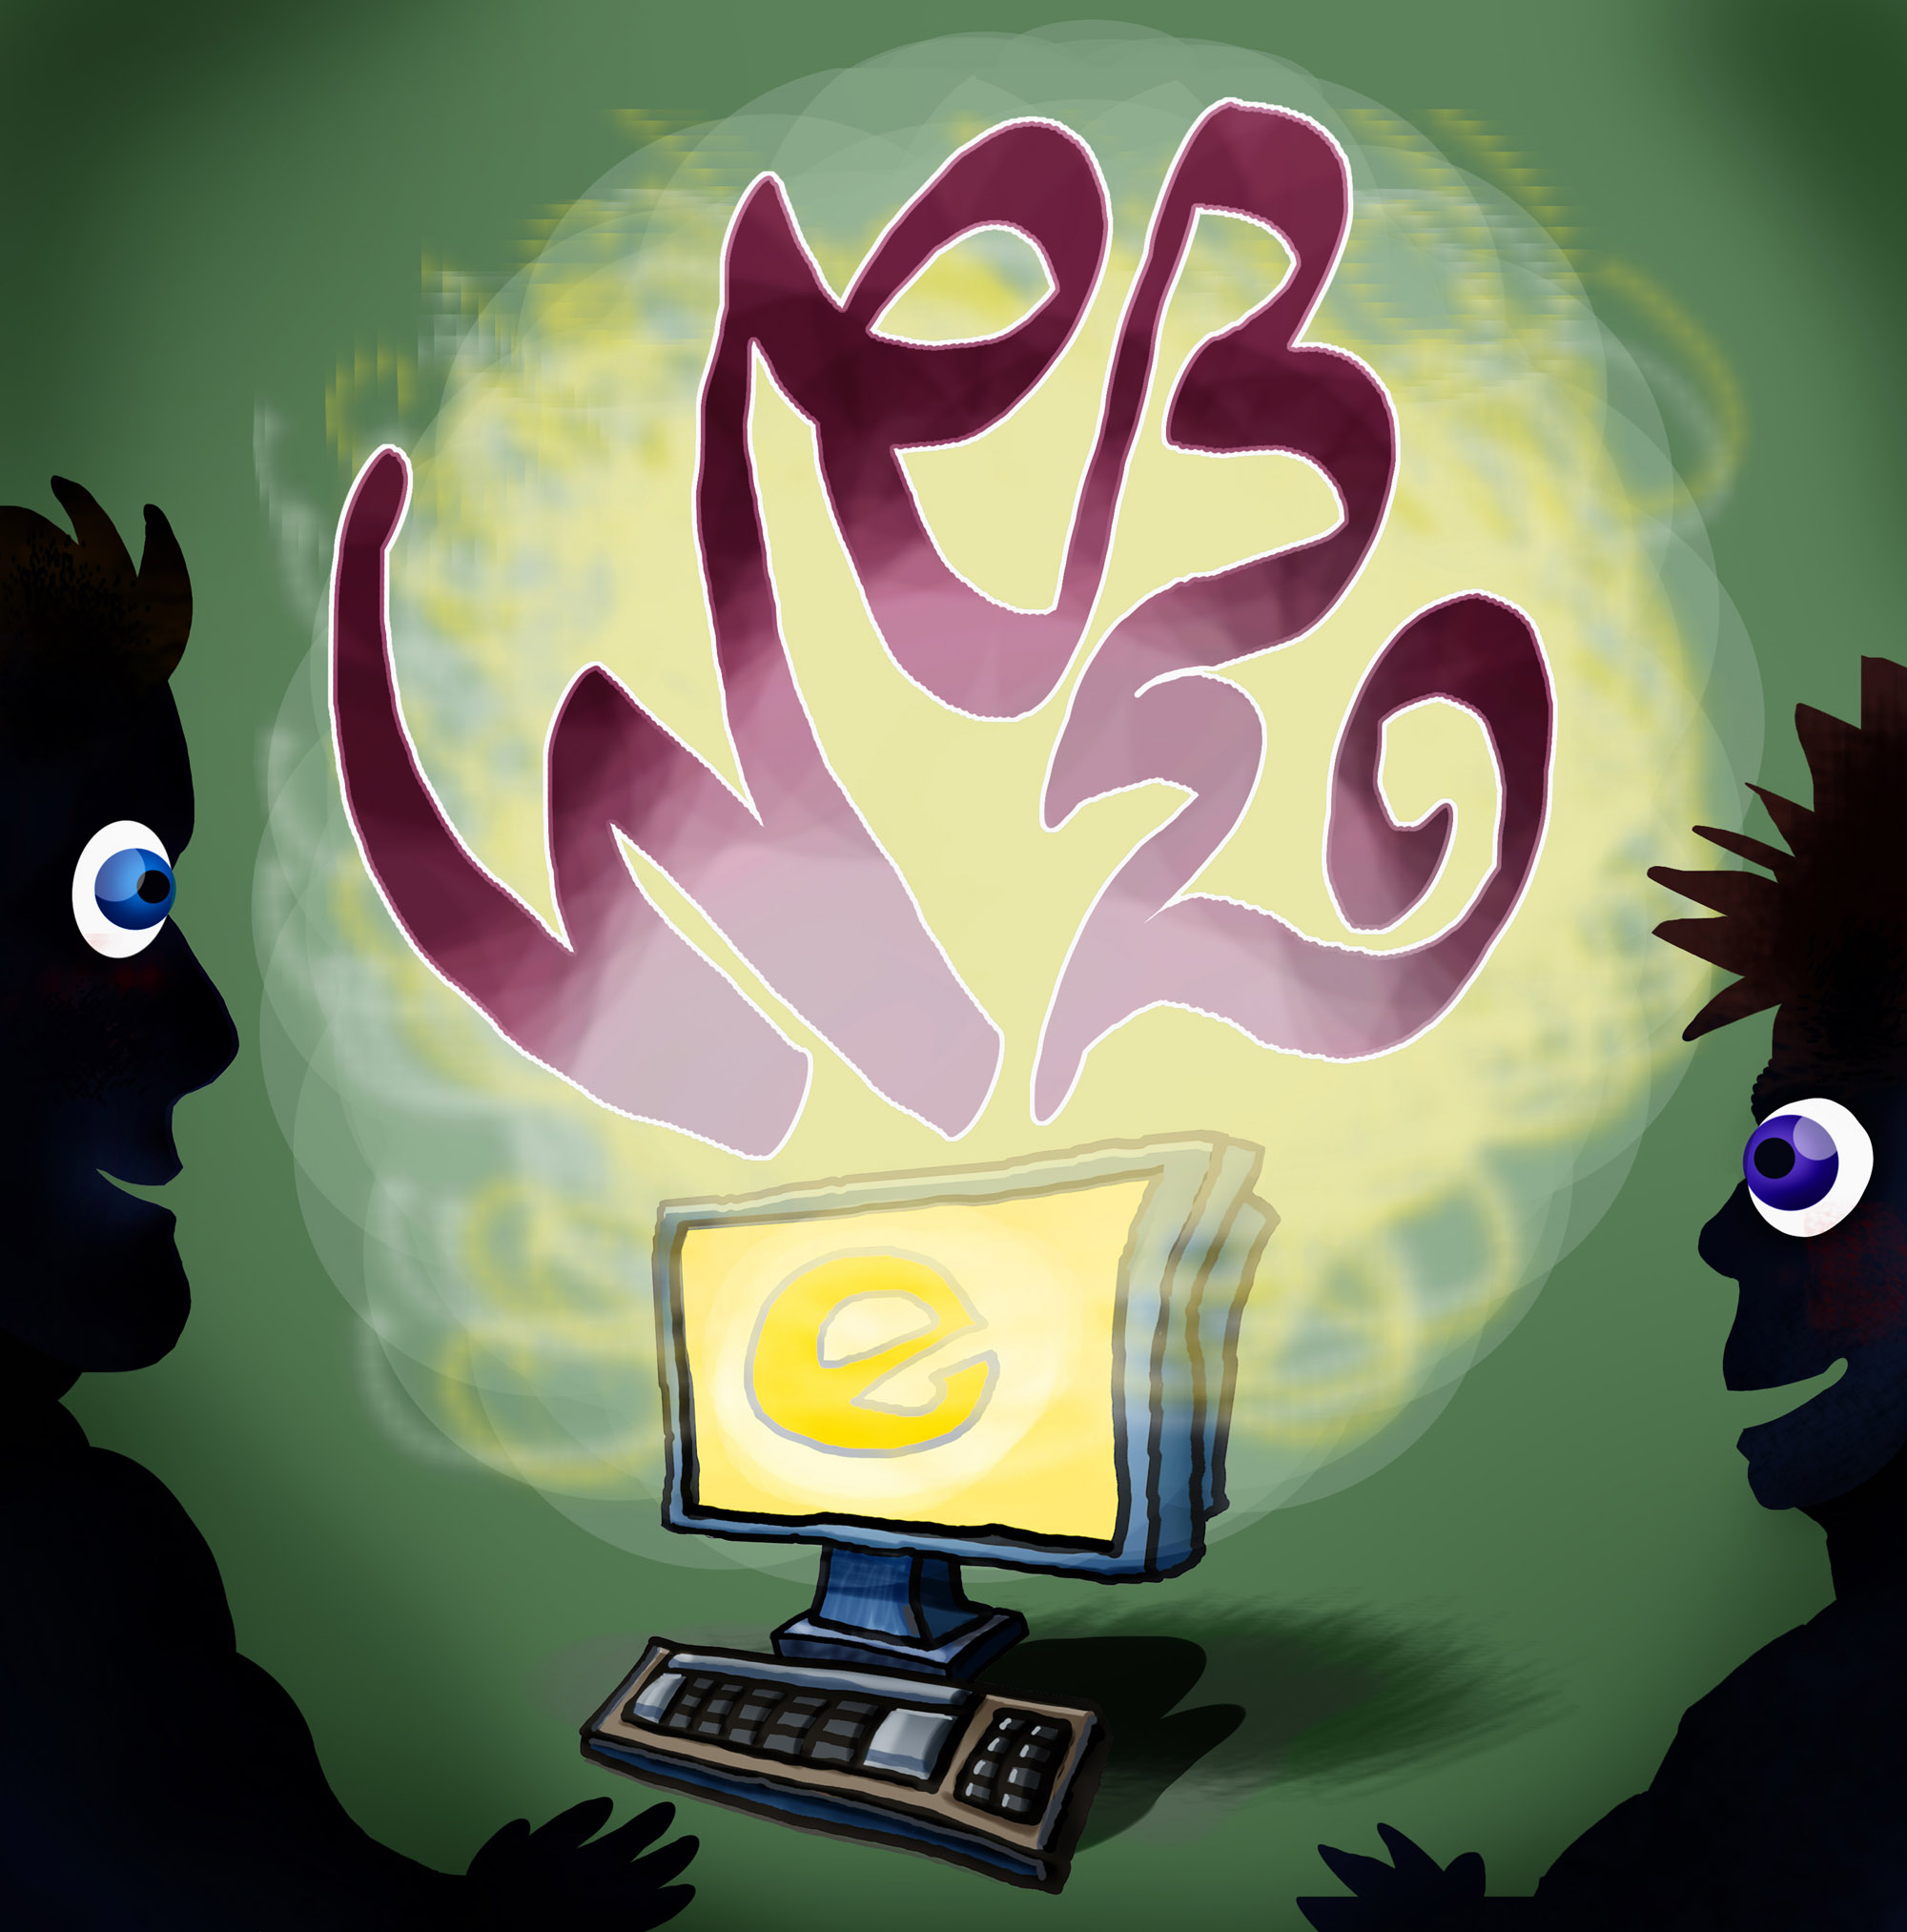 Internet-Generation, Quelle: WikiCommons, siehe Ende des Artikels